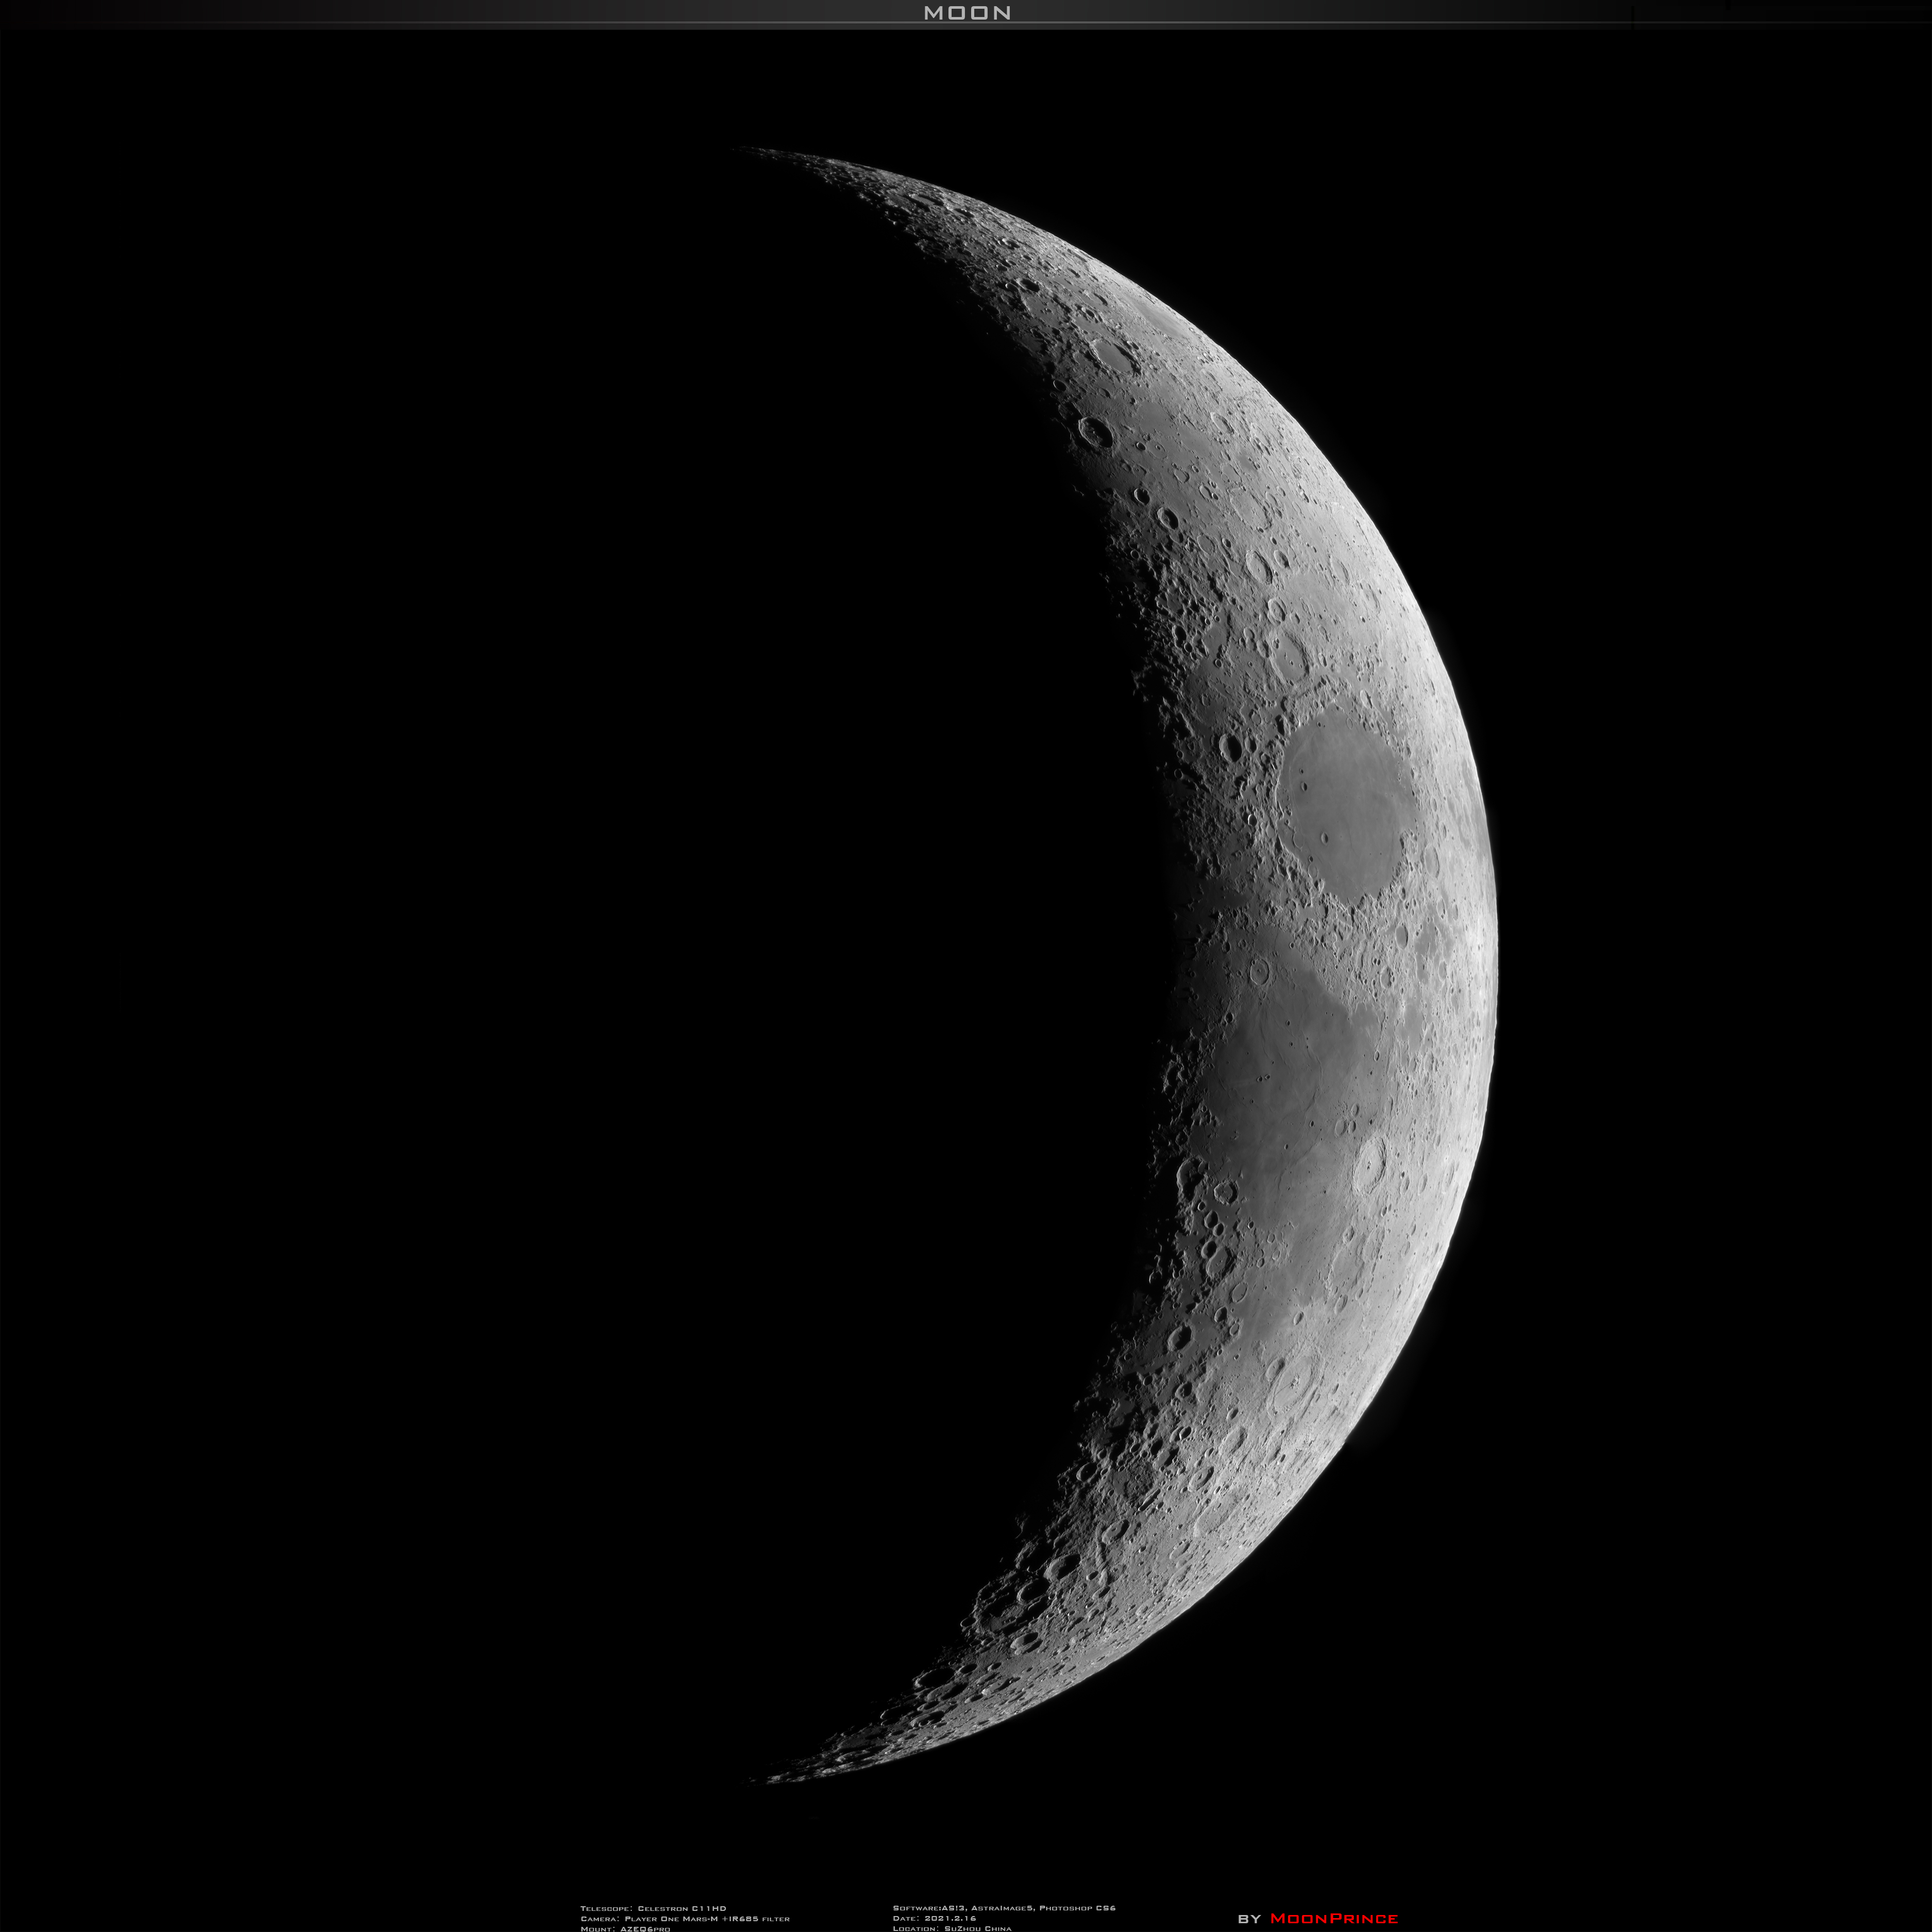 Moon20210216-S50.jpg